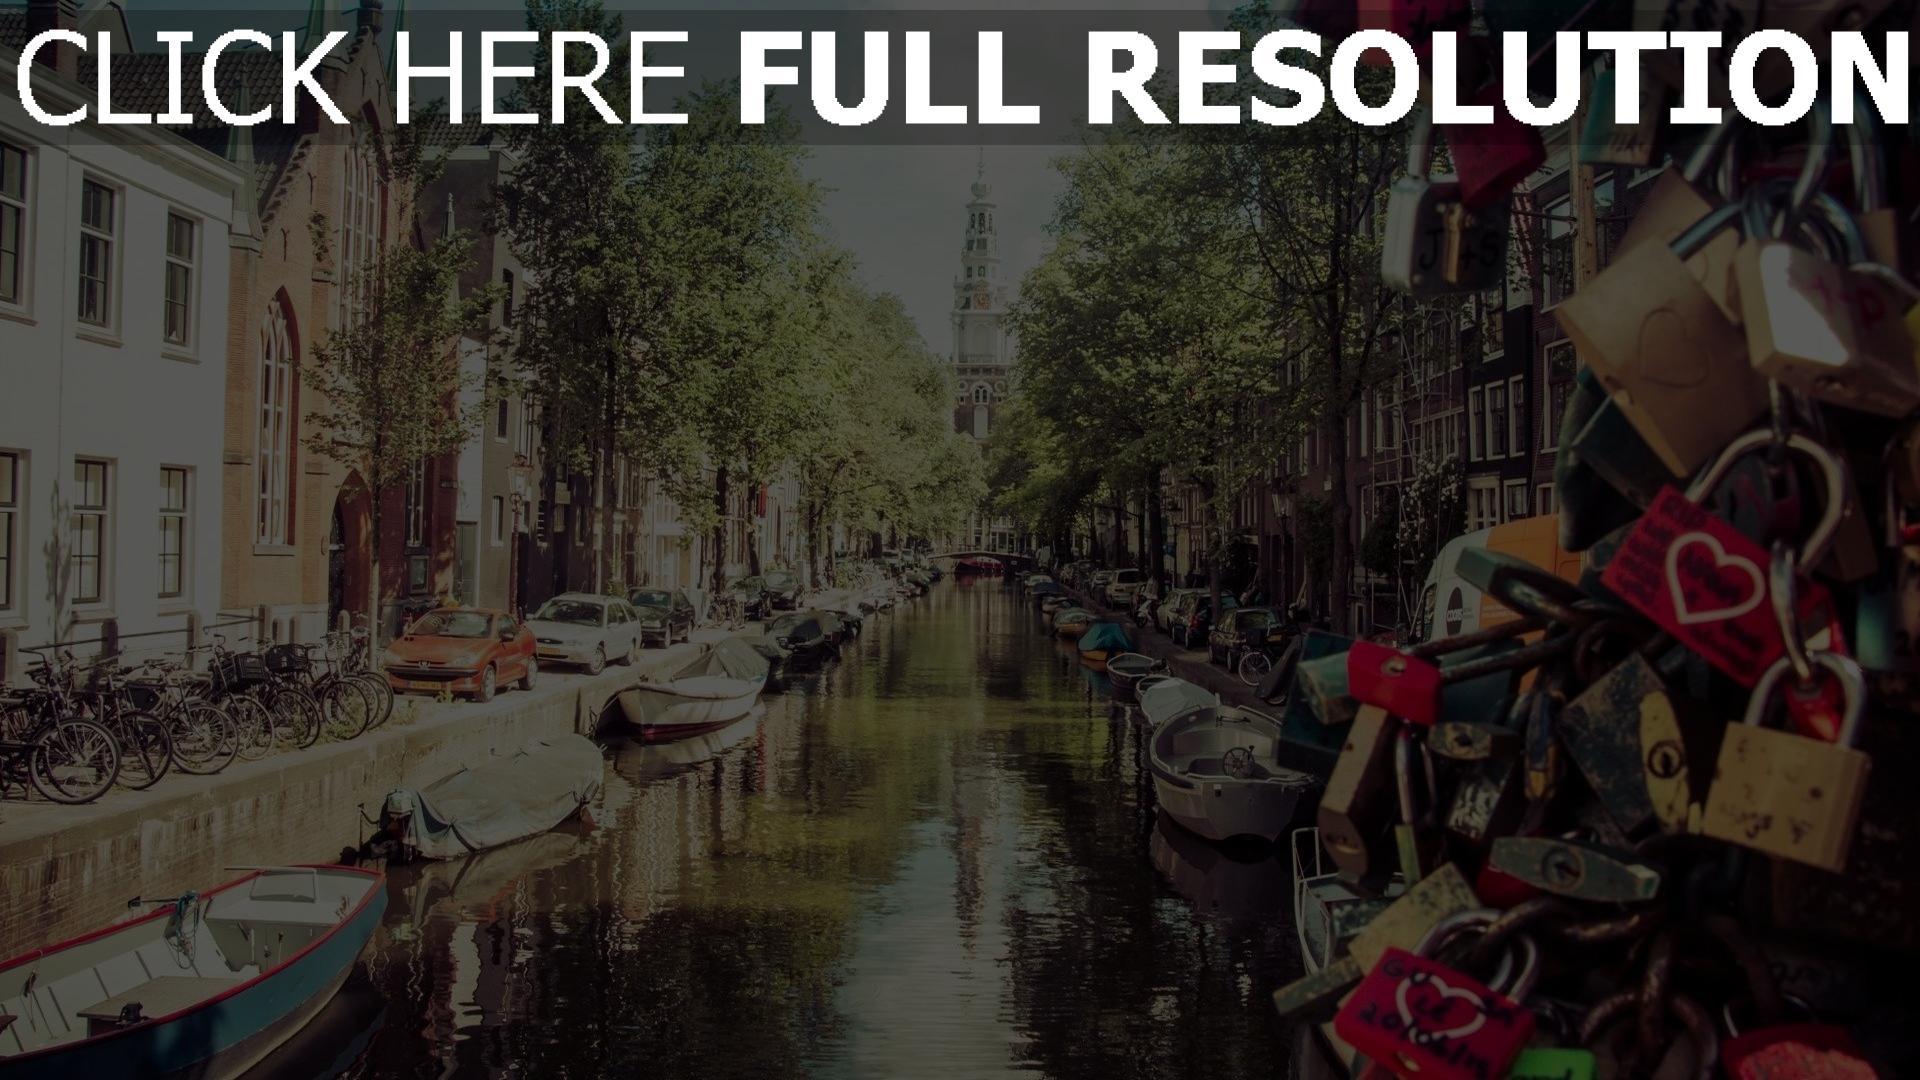 https://hdhintergrundbilder.net/image/2832/amsterdam-sommer-hausbooten-schloesser.jpg